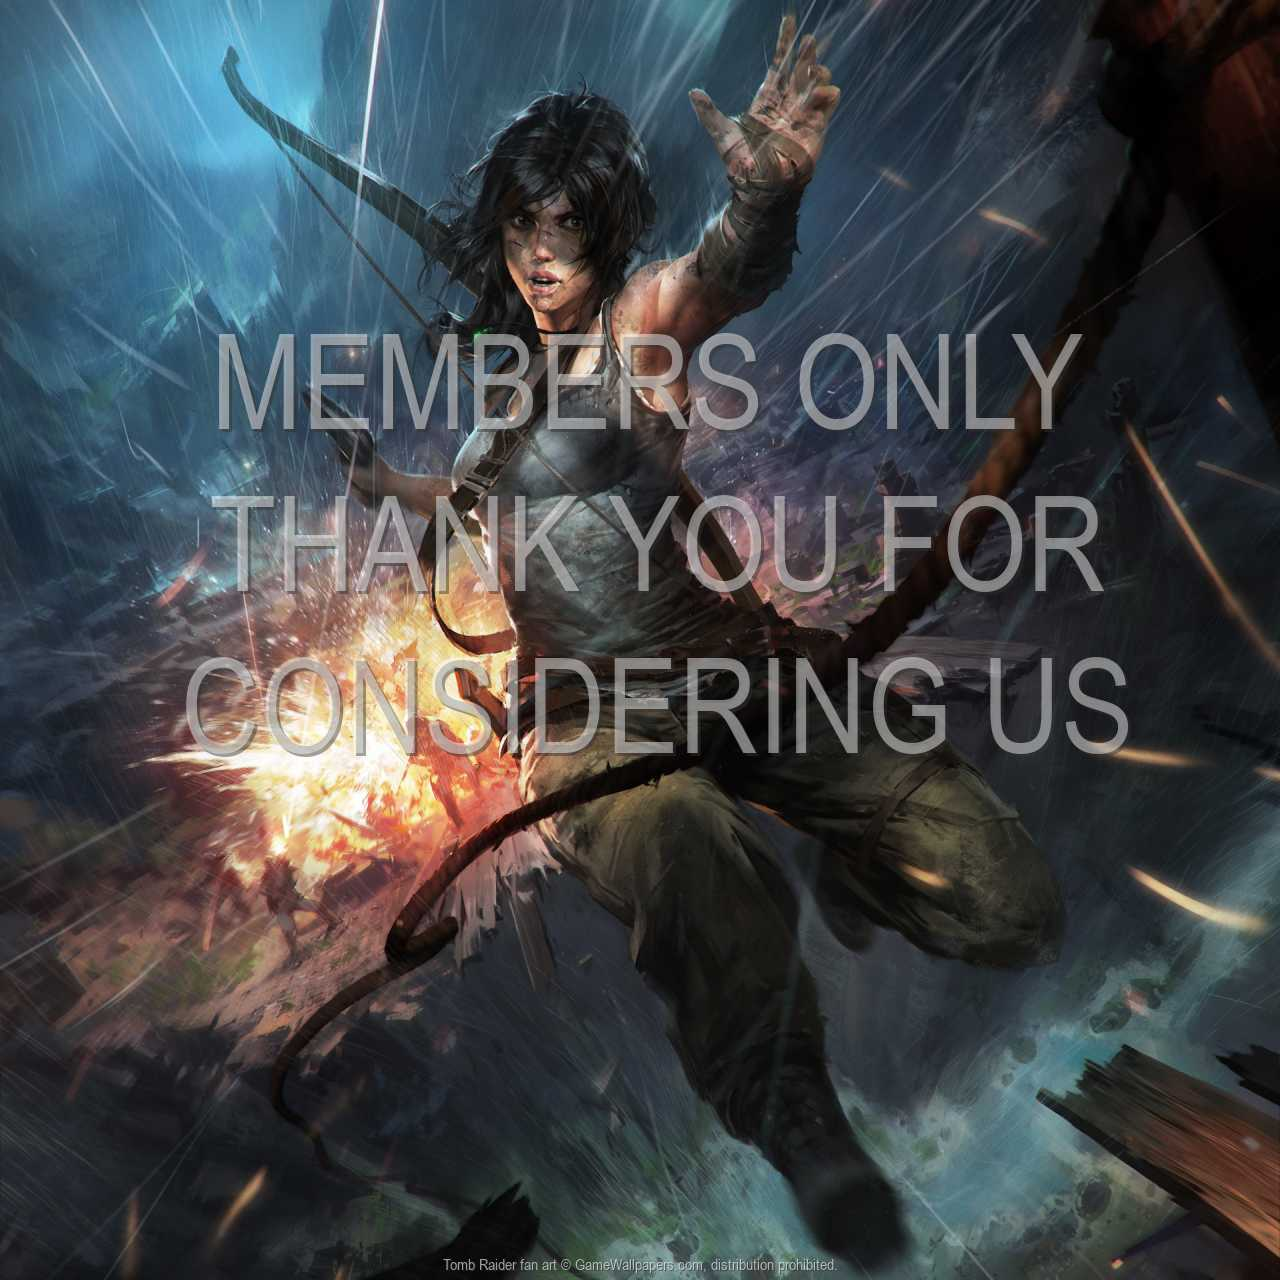 Tomb Raider fan art 720p Horizontal Handy Hintergrundbild 04